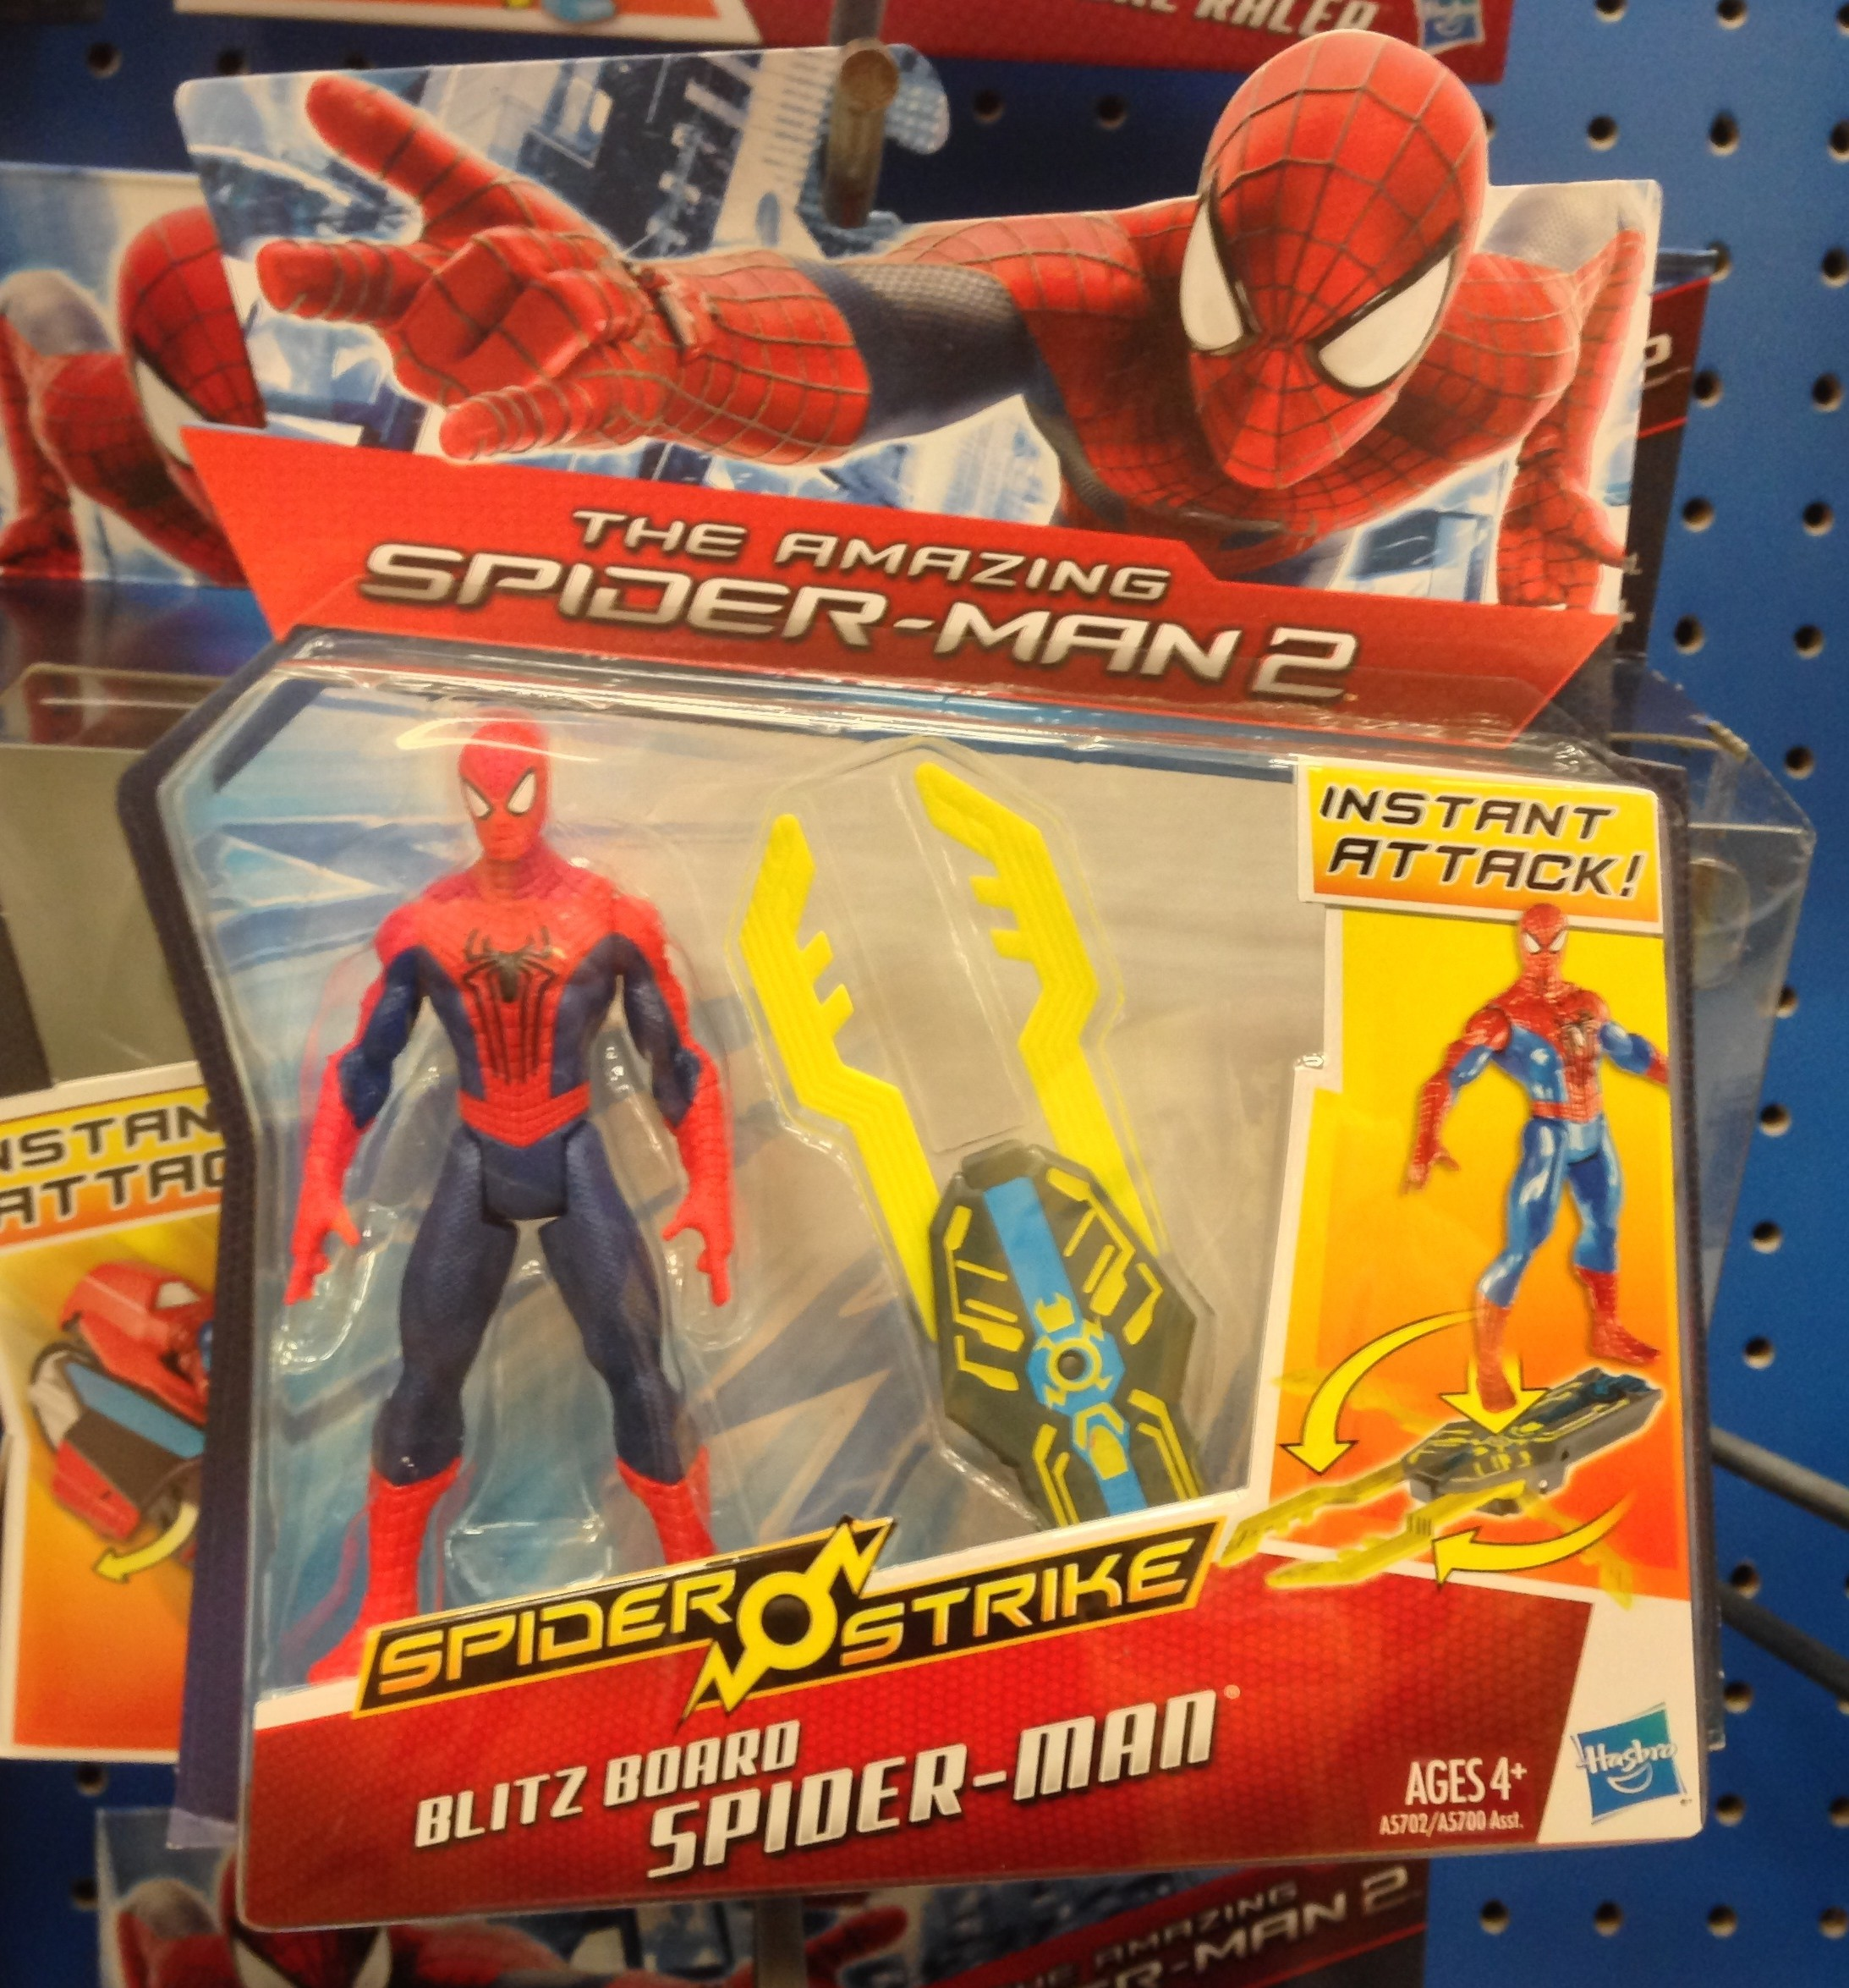 New! Hasbro Amazing Spider-Man 2 Slash Gauntlet Spider-Man action figure